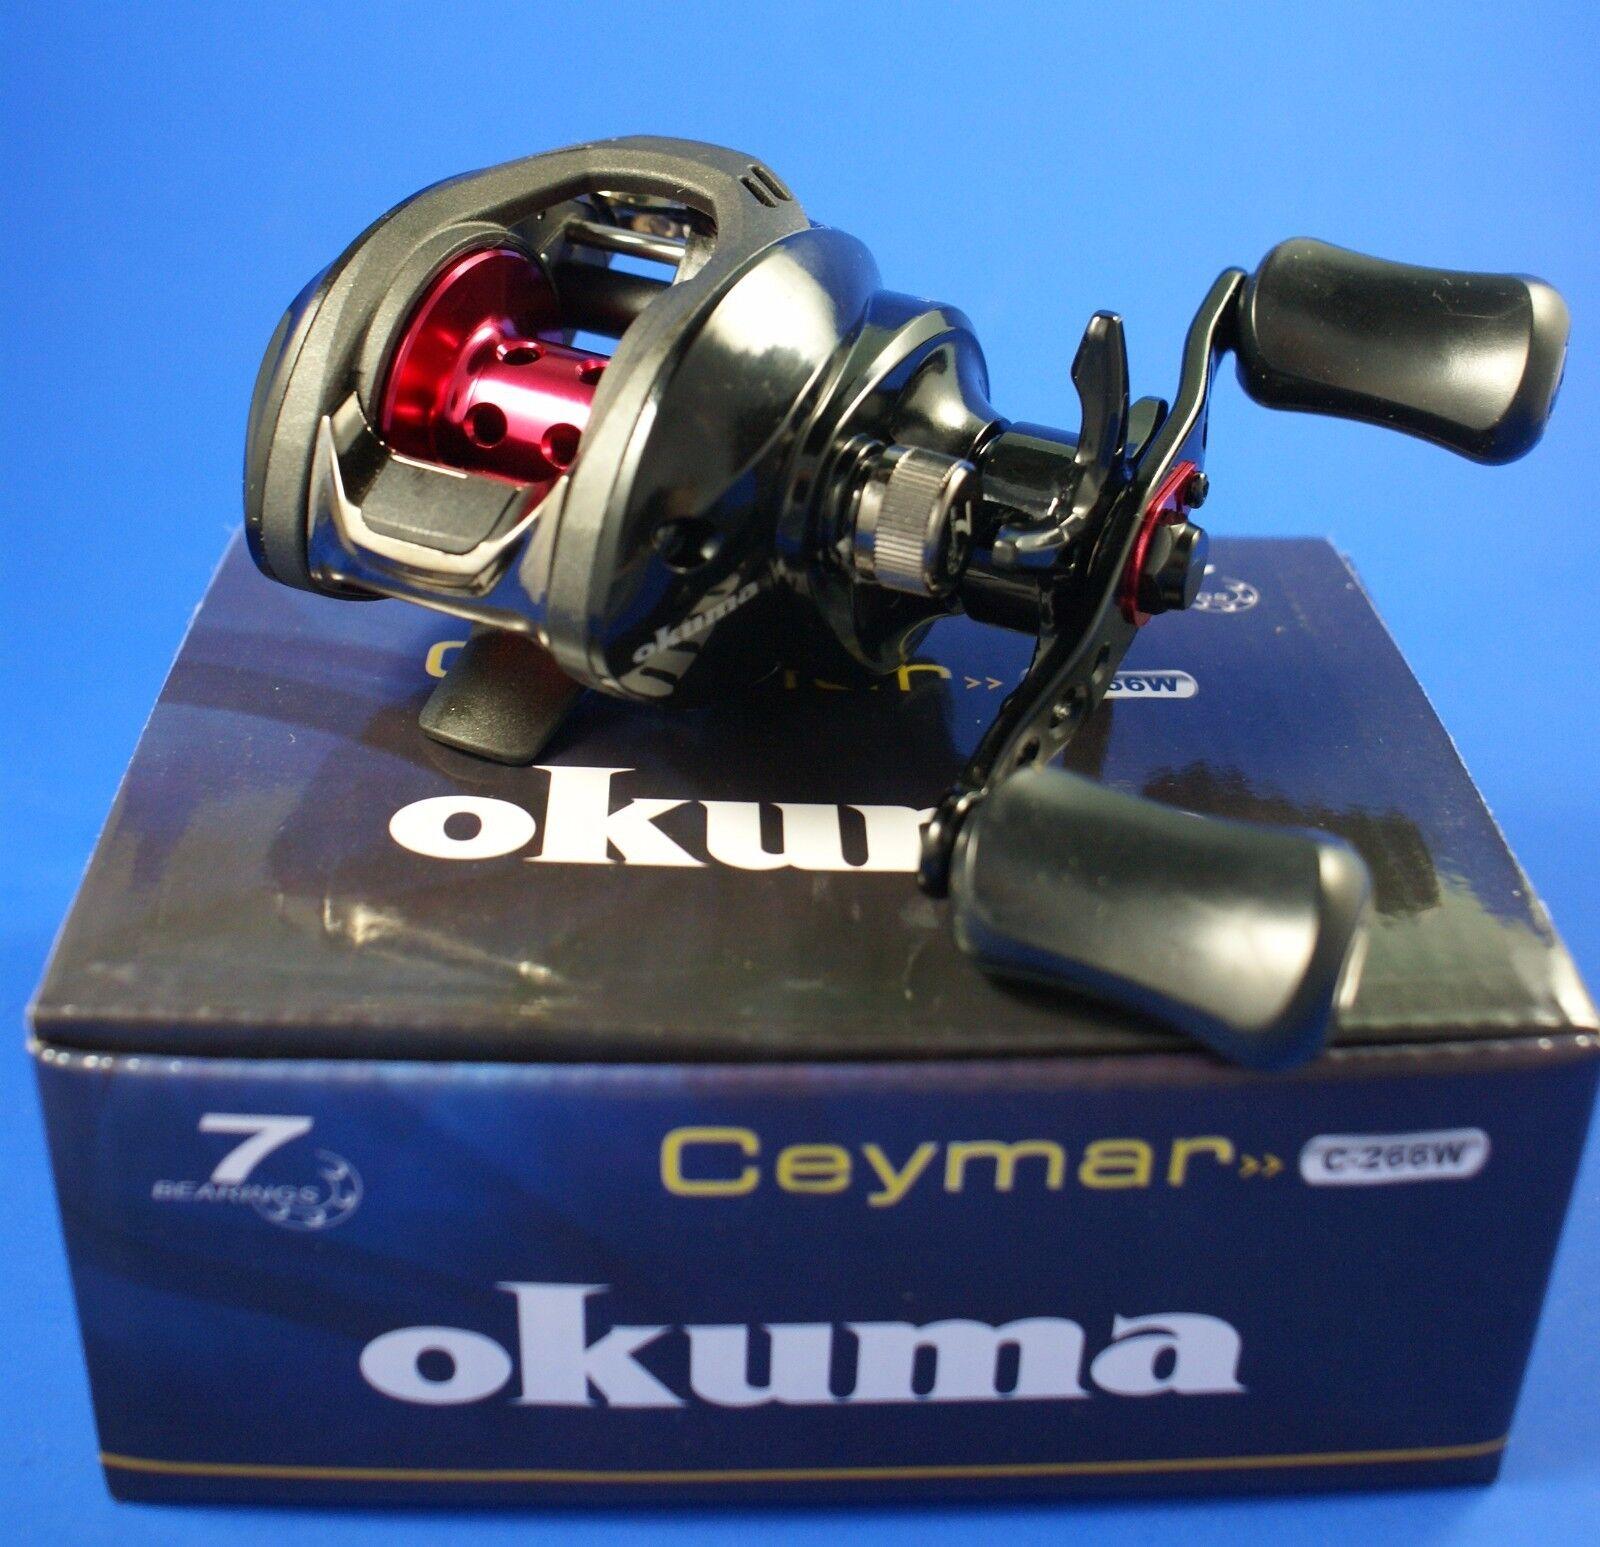 Okuma Ceymar LowProfile C-266W 6+1BB 6.6 1 54294 Baitcasting Fishing Reel RH